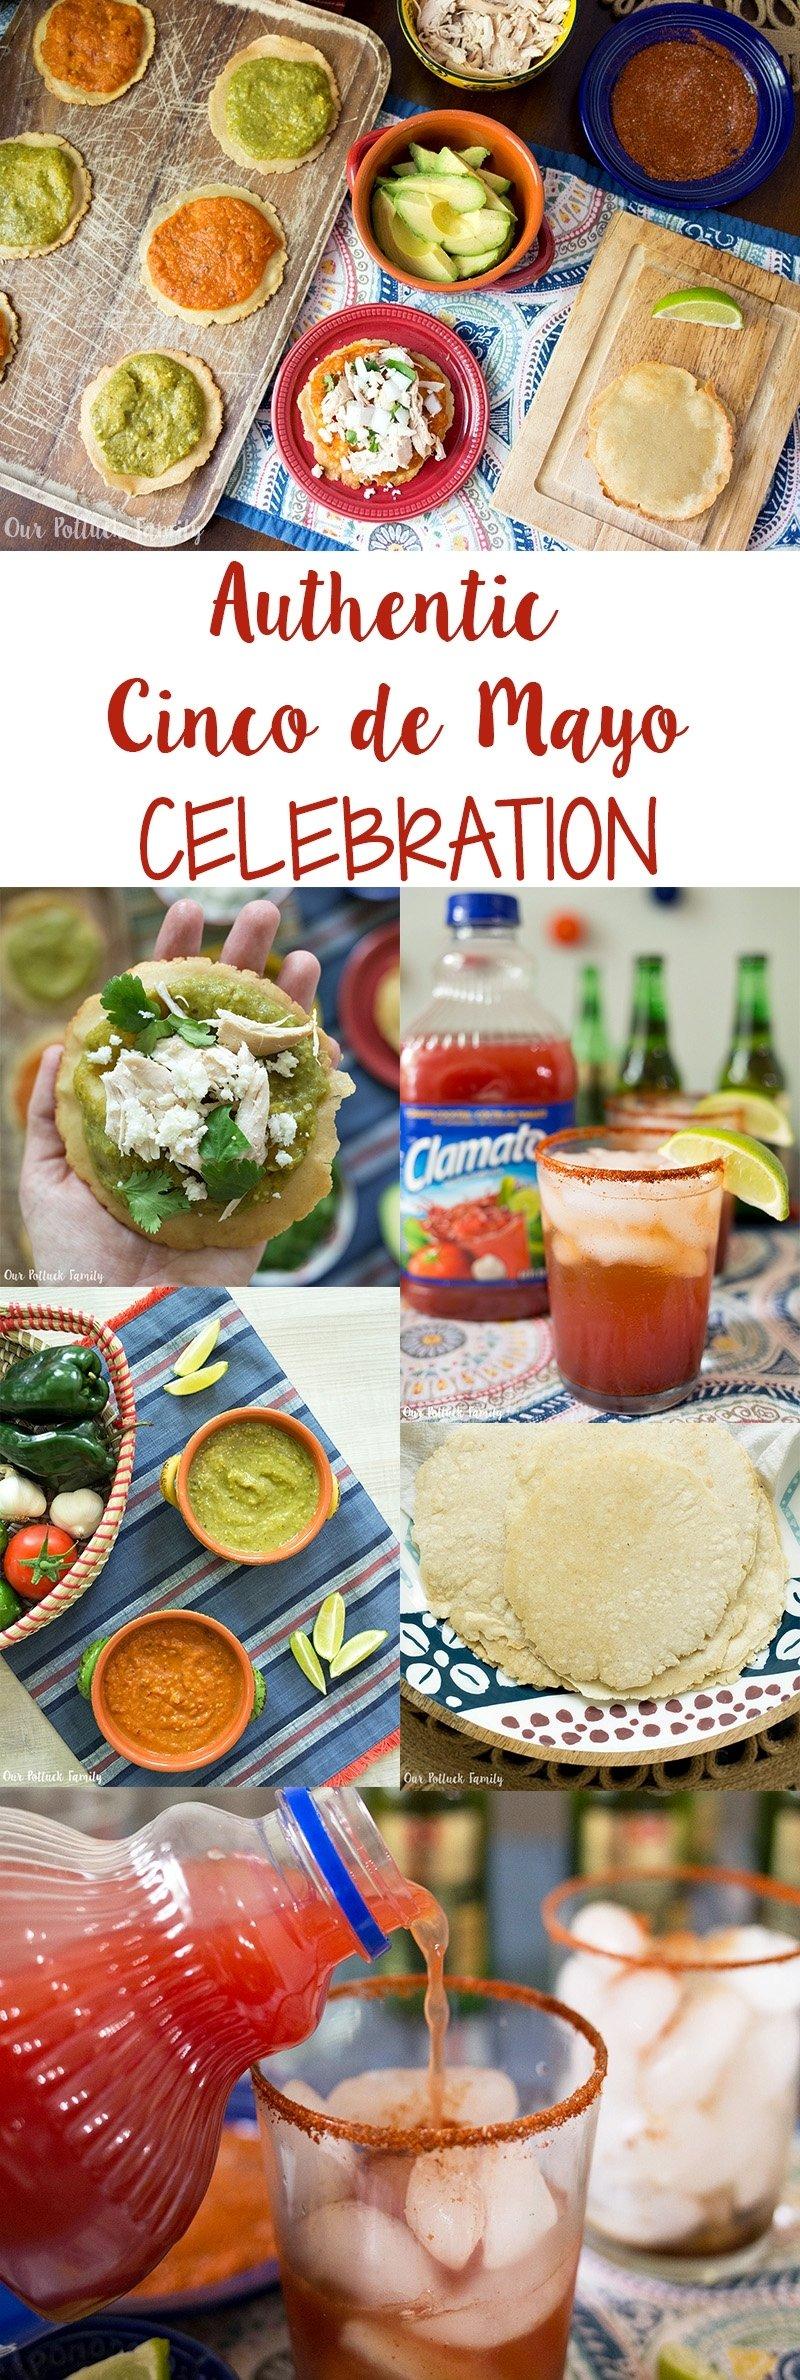 10 Most Recommended Cinco De Mayo Potluck Ideas authentic cinco de mayo celebration ideas our potluck family 2021